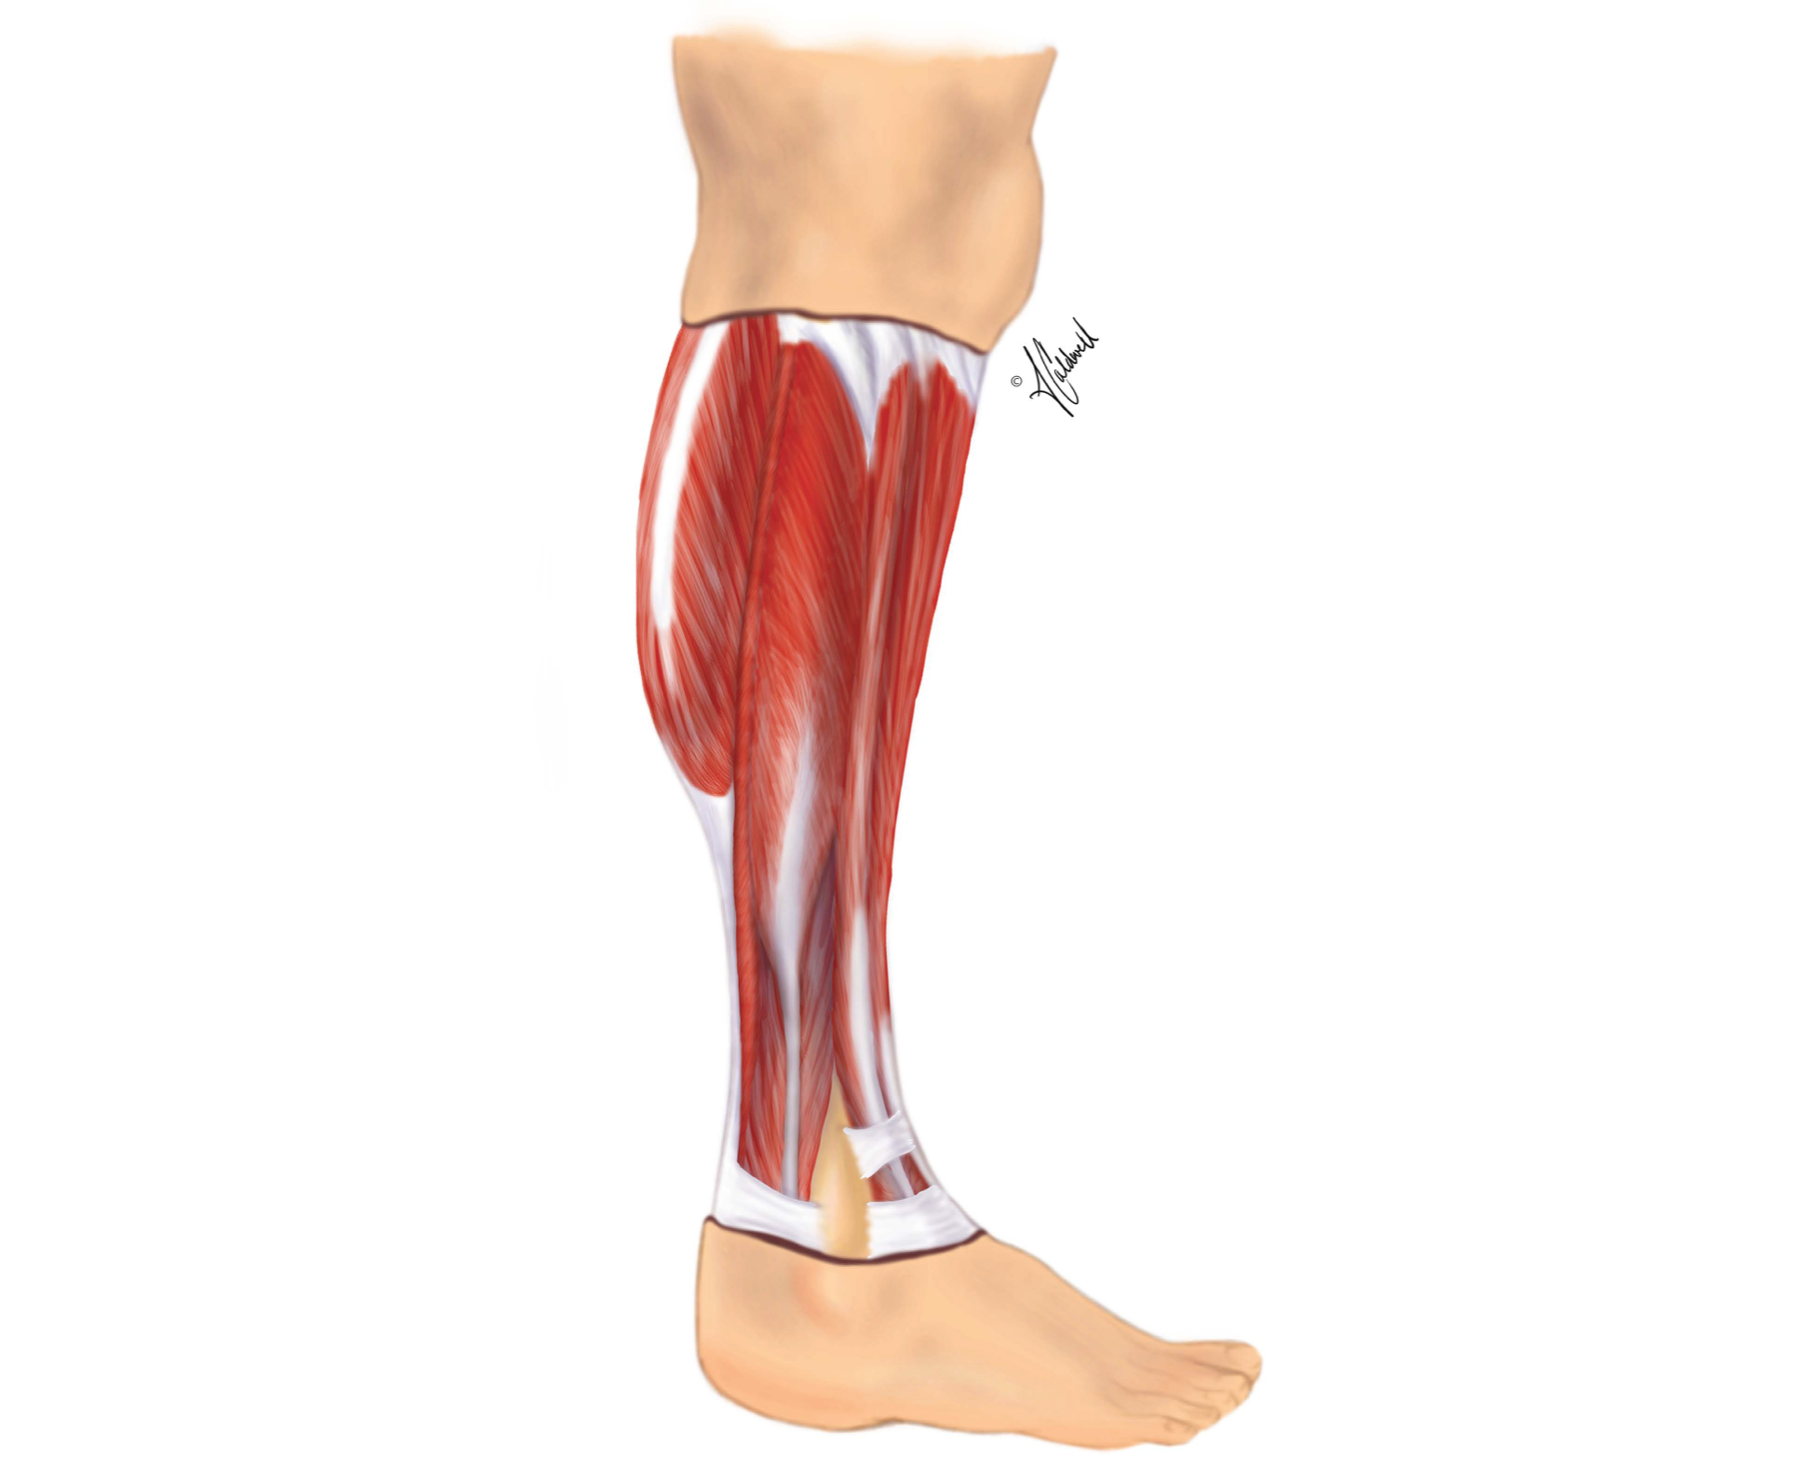 Anatomy of Lower Leg